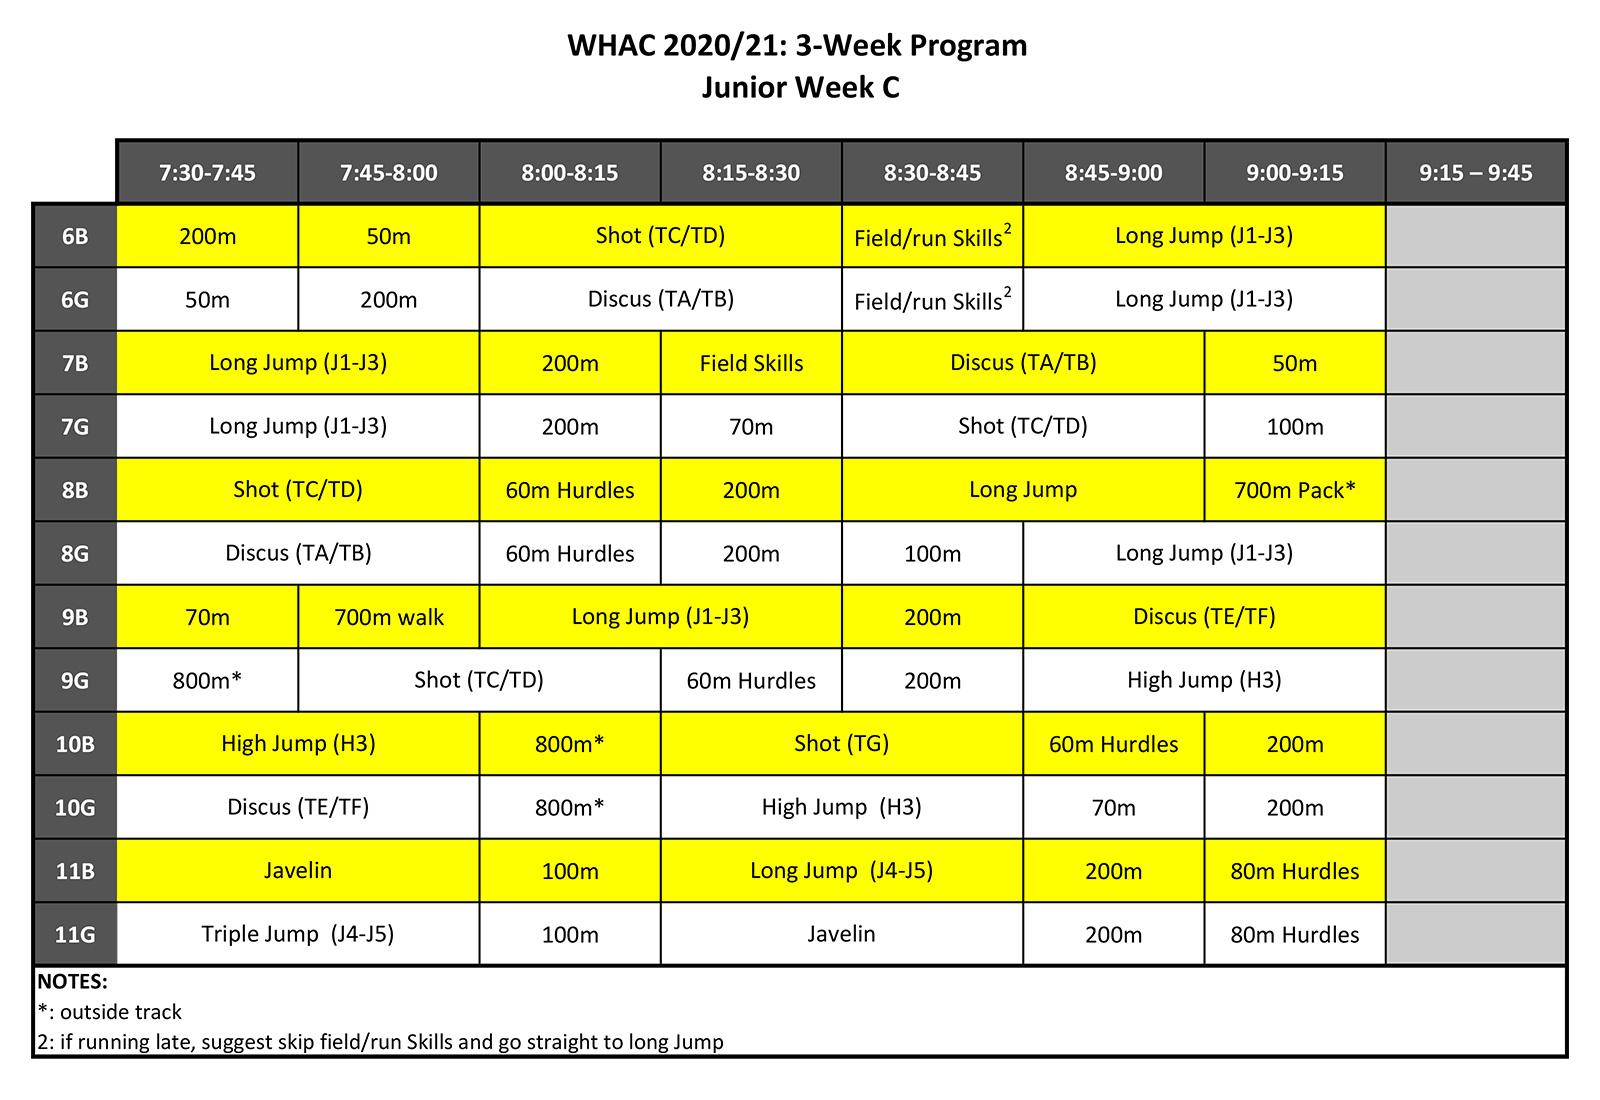 JUNIOR PROGRAM WEEK C 2020/21